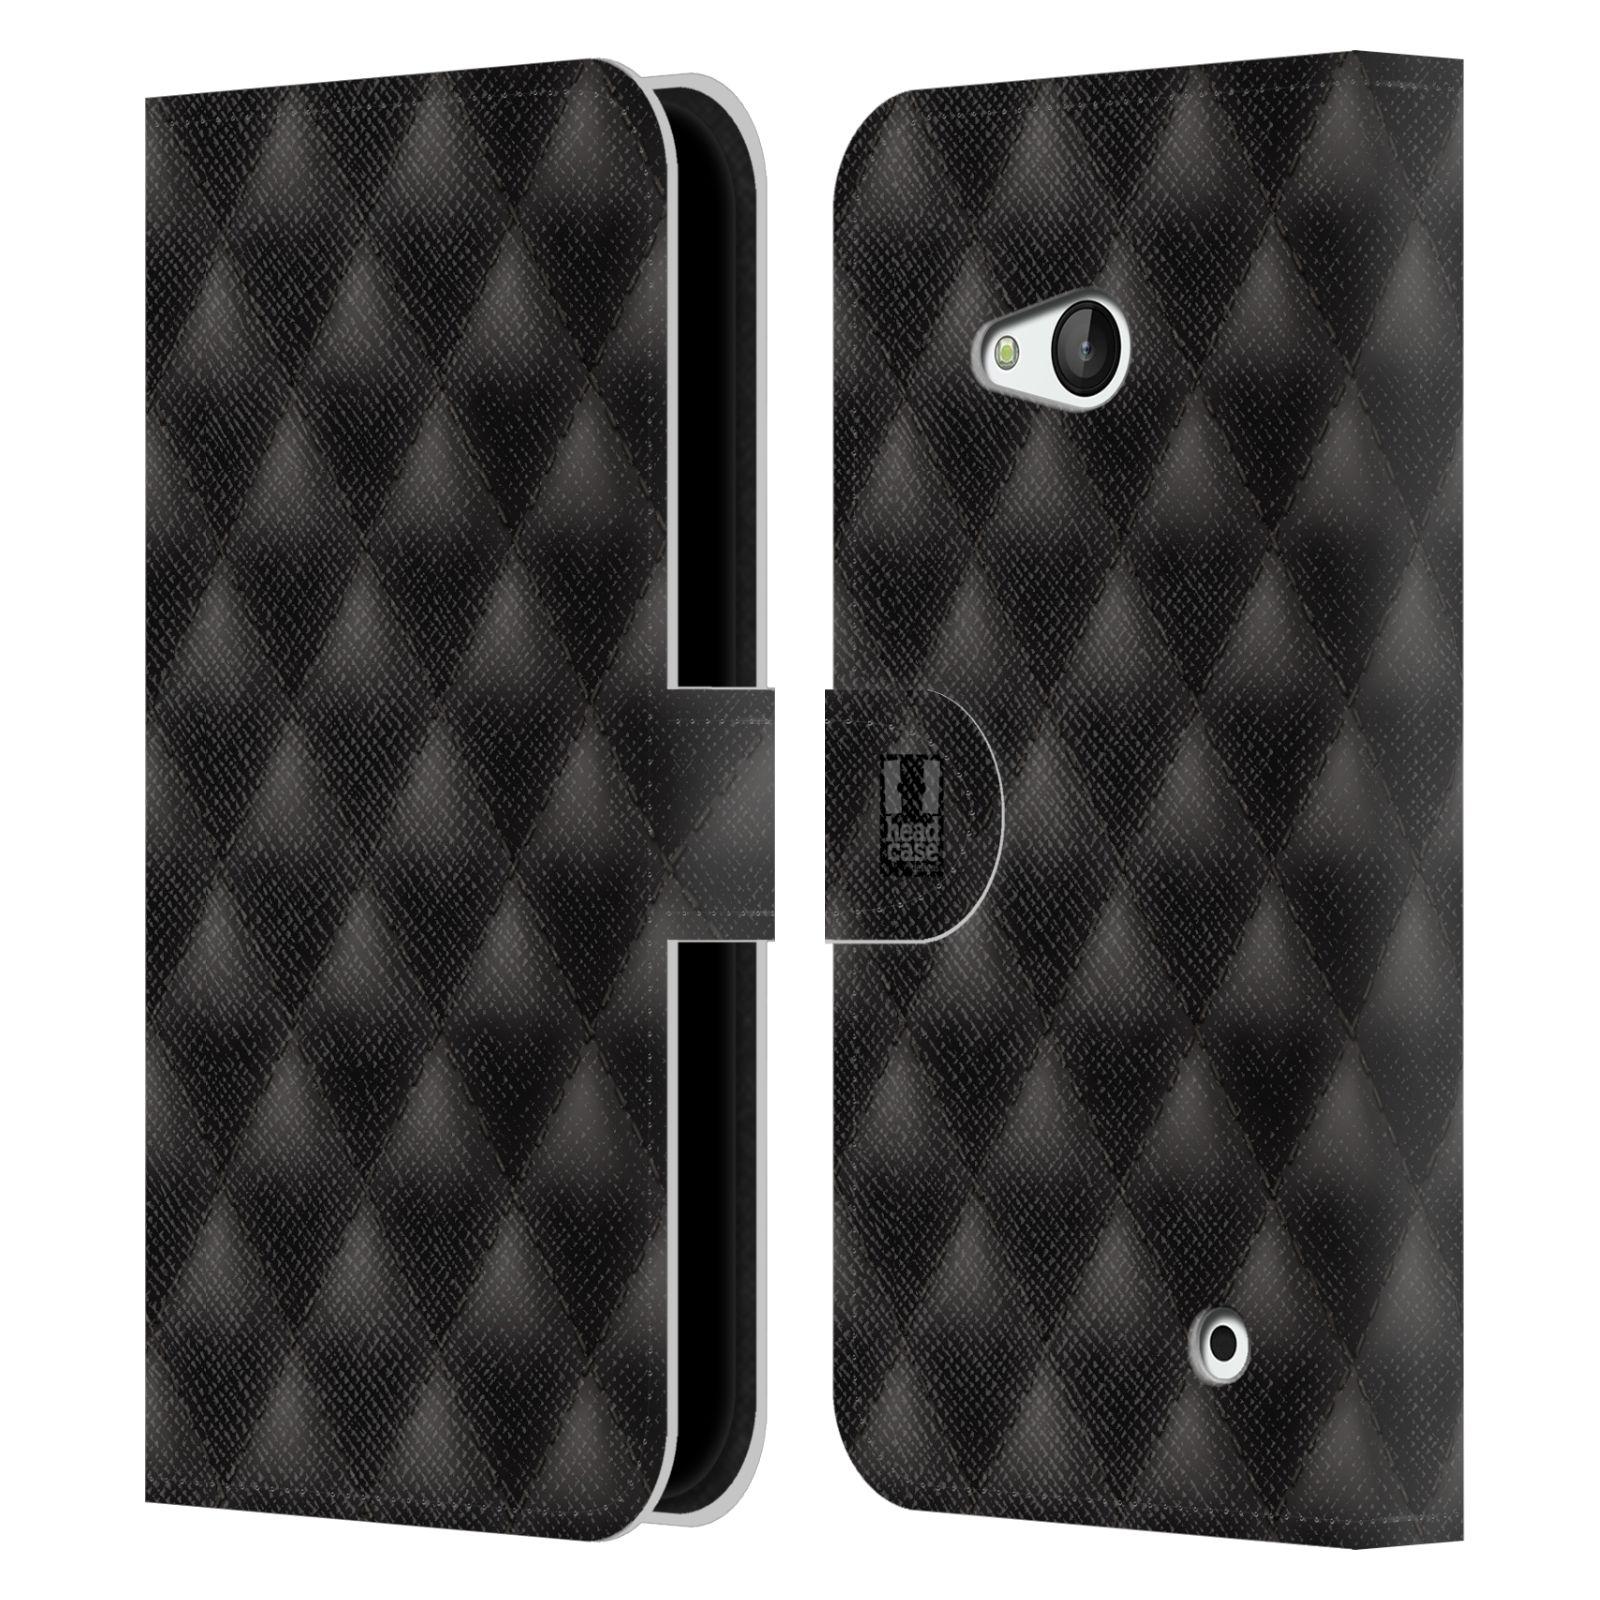 head case kissen brieftasche handyh lle aus leder f r microsoft nokia phones ebay. Black Bedroom Furniture Sets. Home Design Ideas